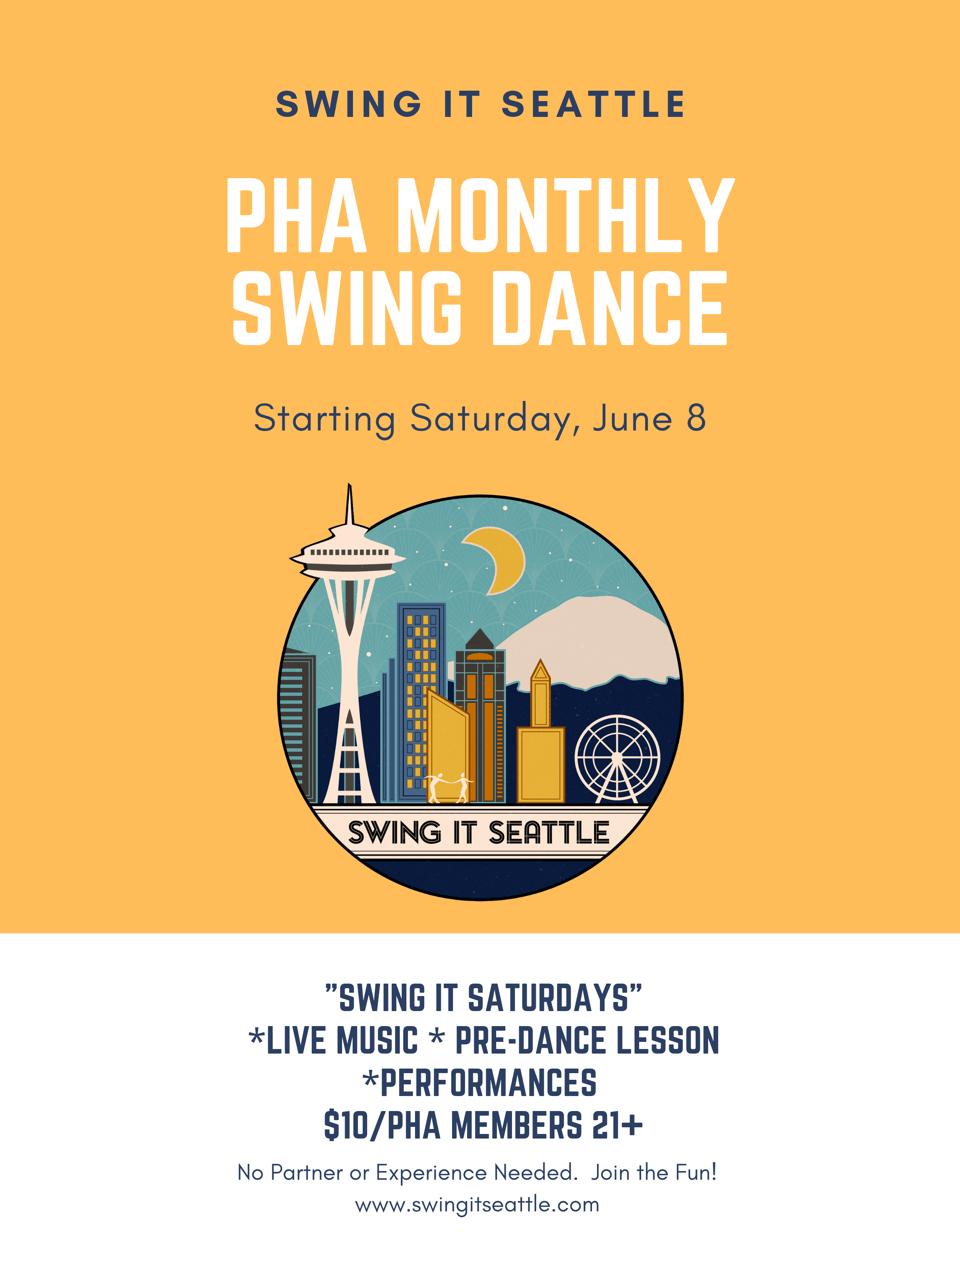 PHA Monthly Swing Dance